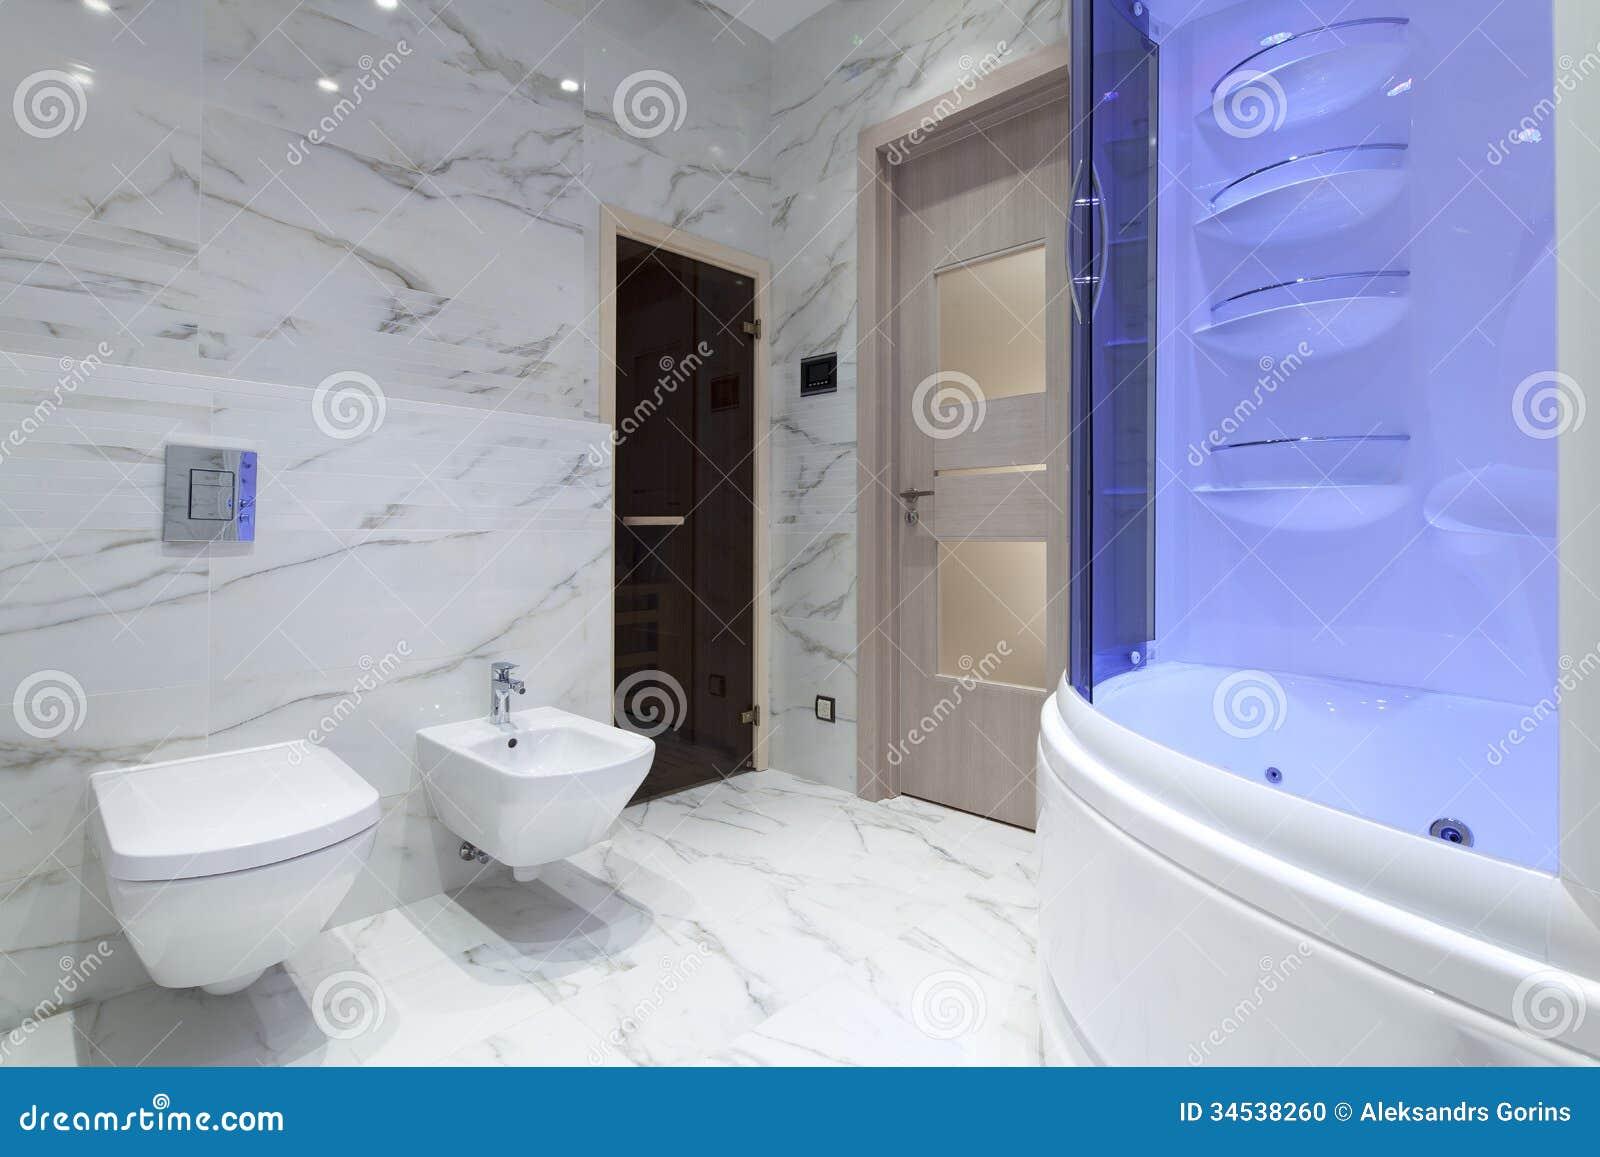 bathroom interior of new designer bathroom in modern style - New Bathroom Style